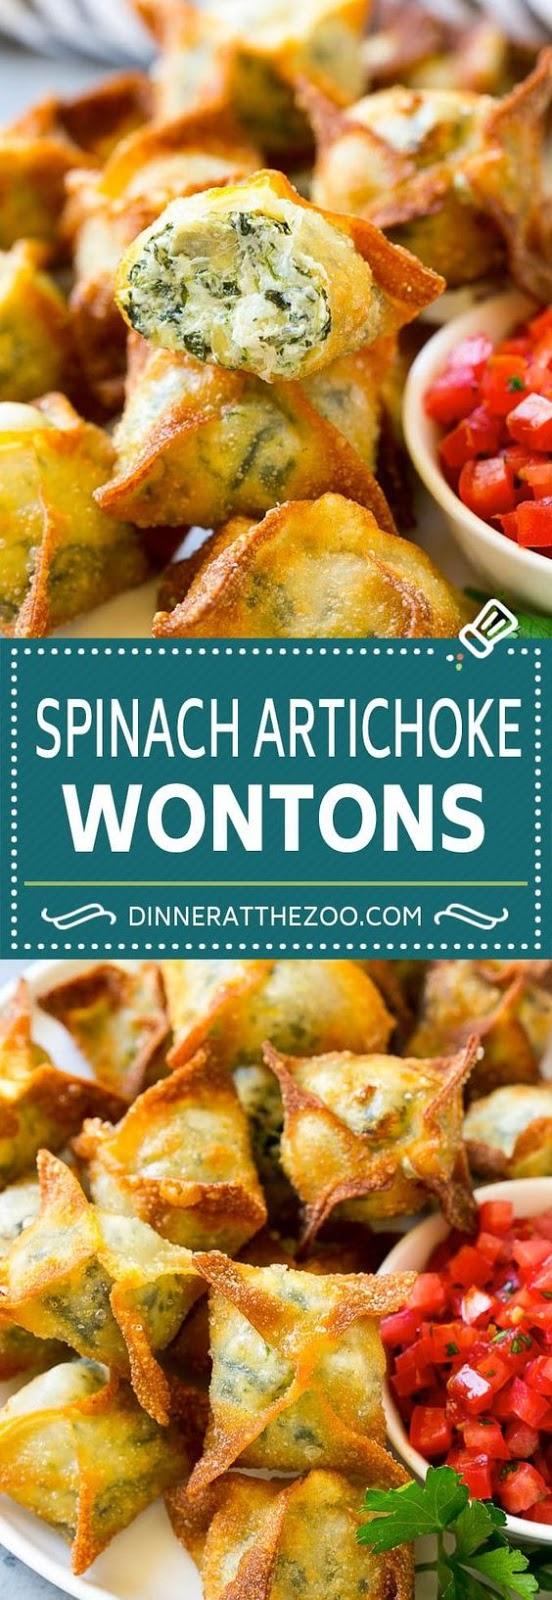 Spinach Artichoke Wontons #appetizer #american #spinach #artichoke #wontons